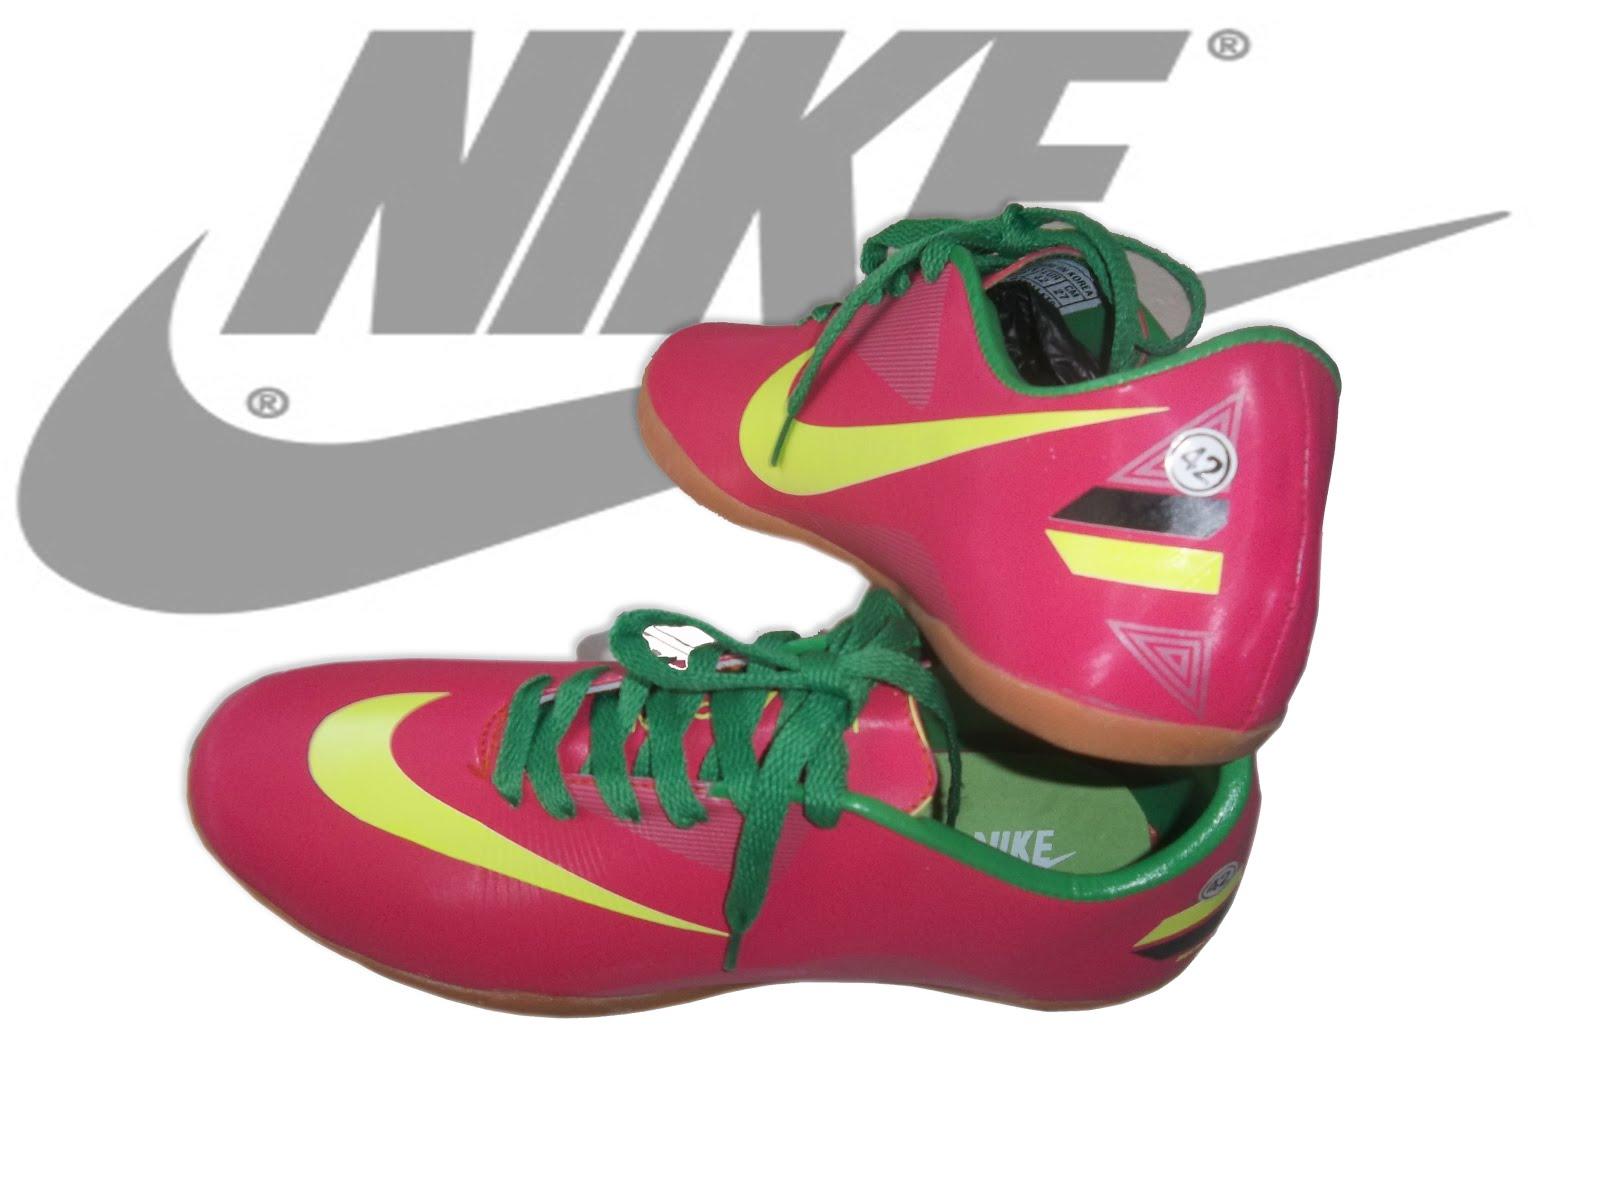 Jual Sepatu Futsal Online Model Sepatu Nike Terbaru 2012